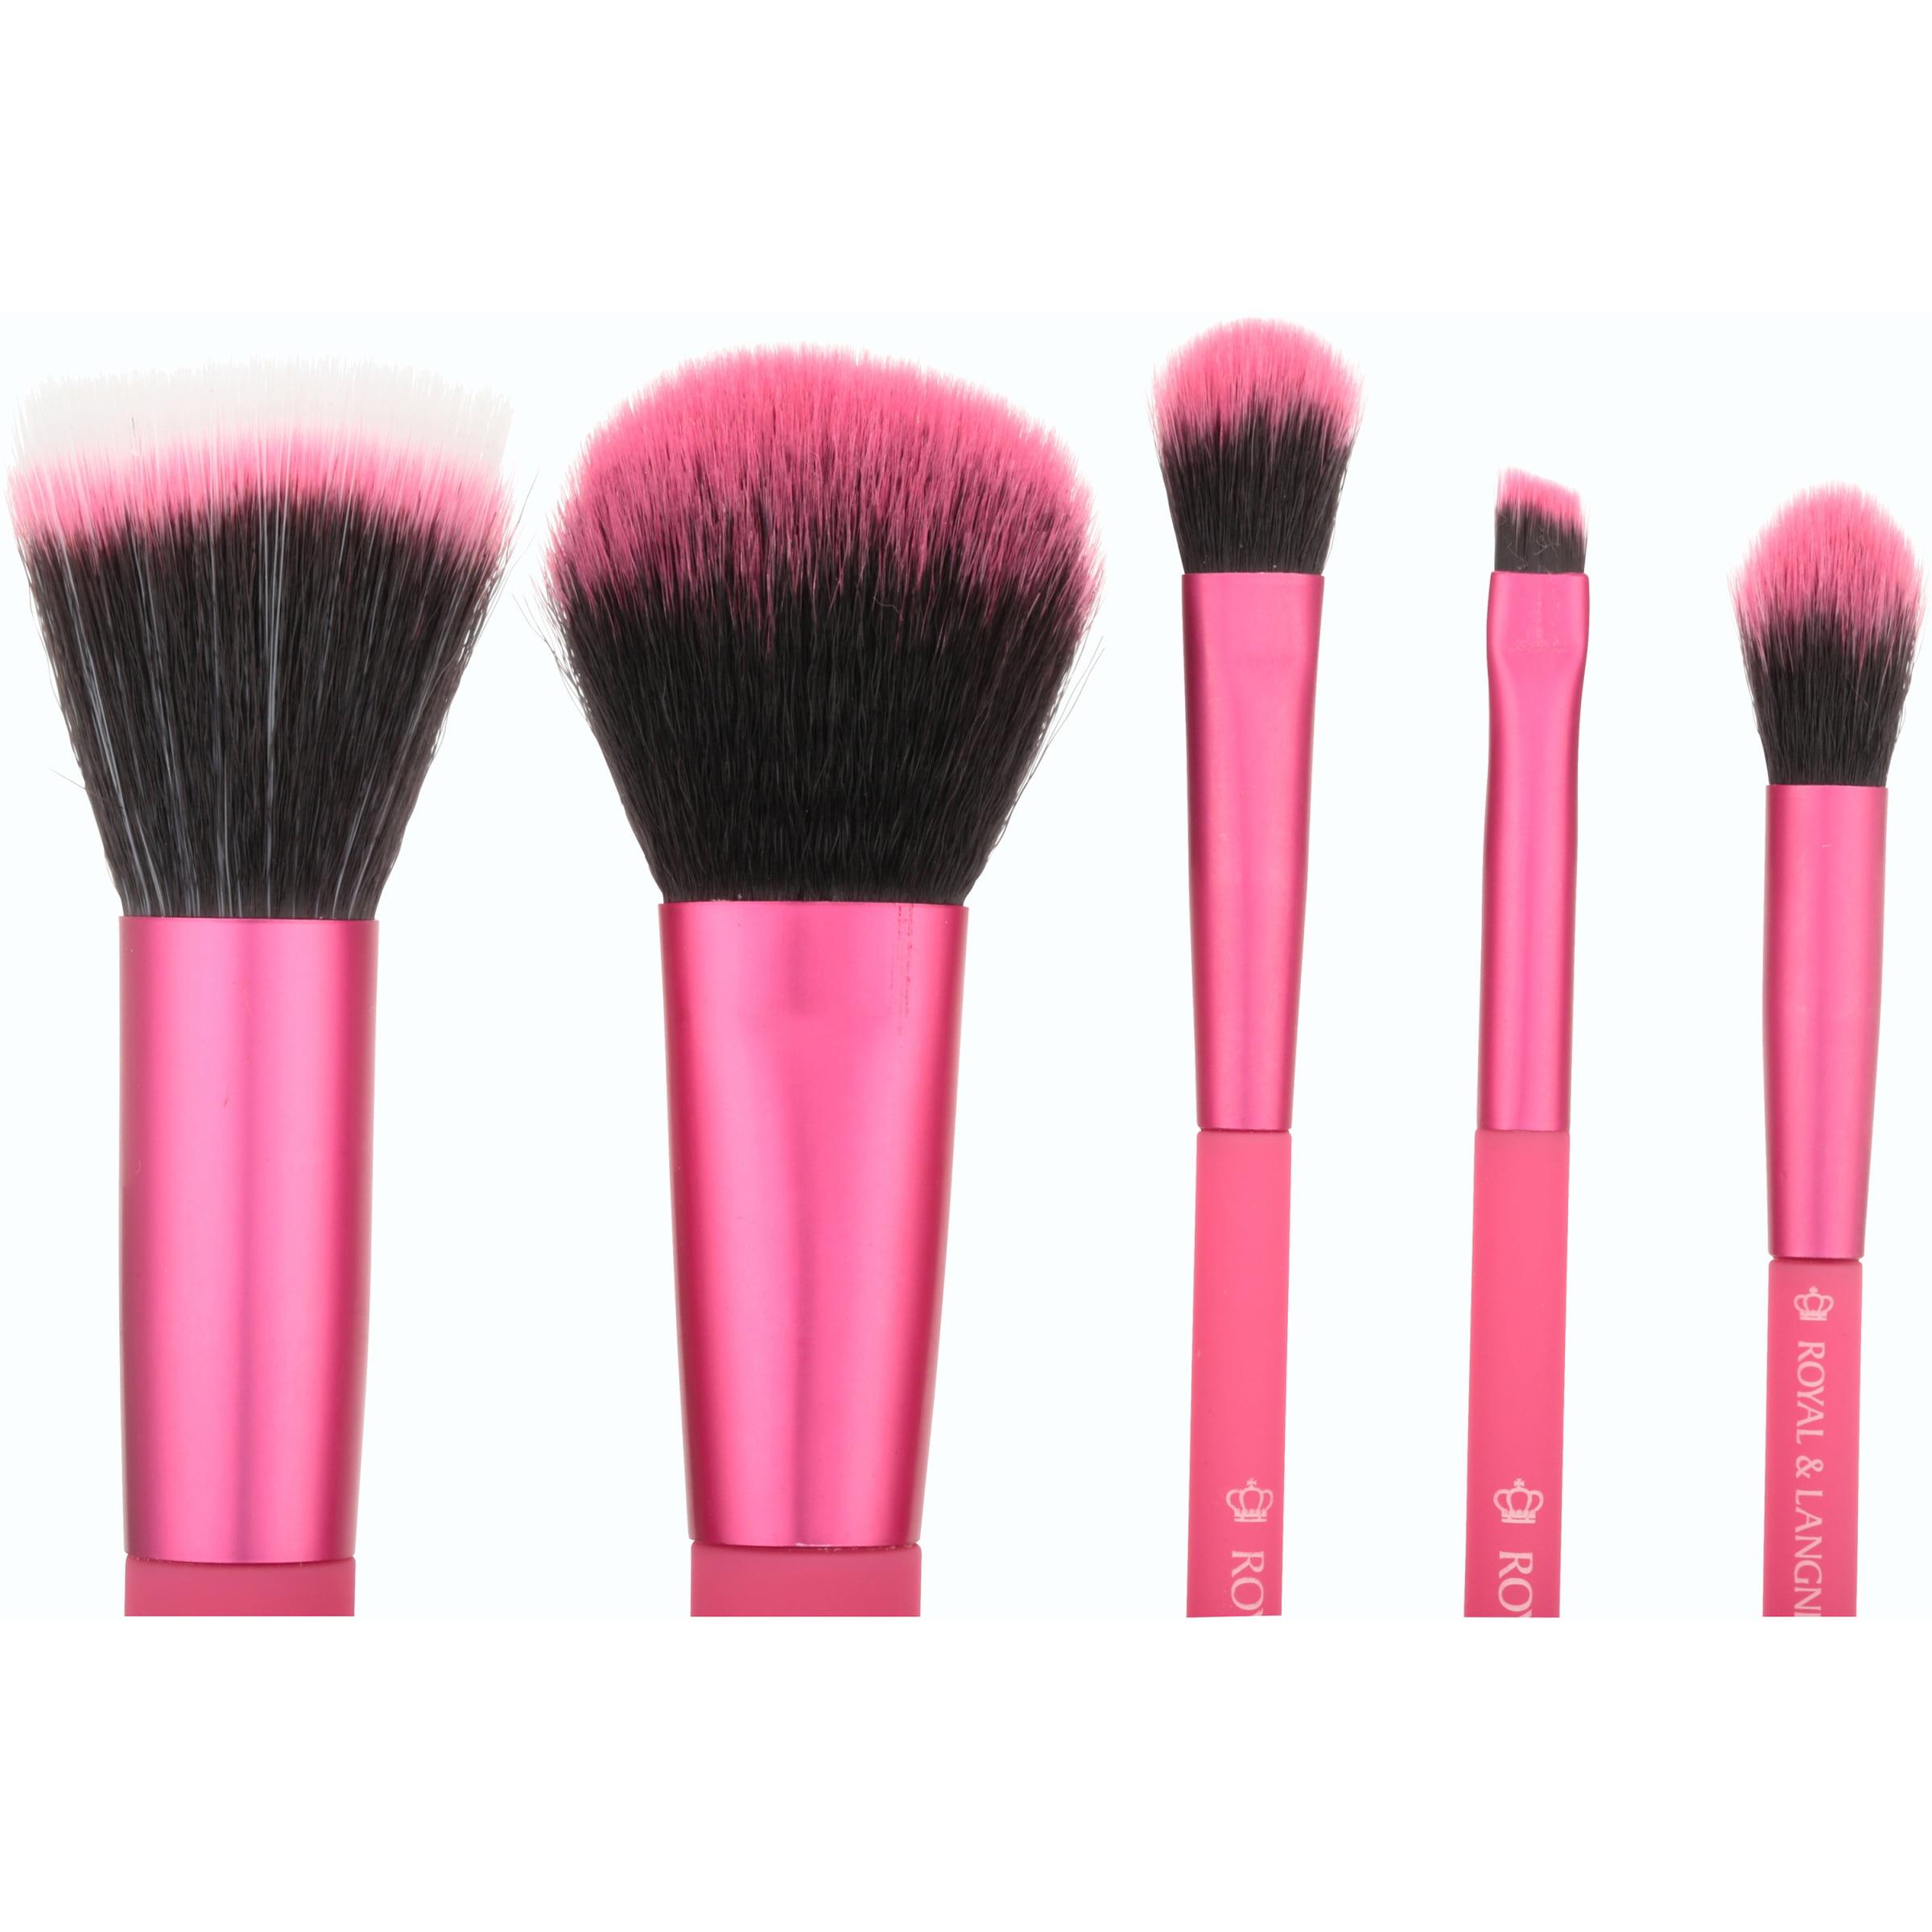 Moda 6pc Perfect Mineral Makeup Brush